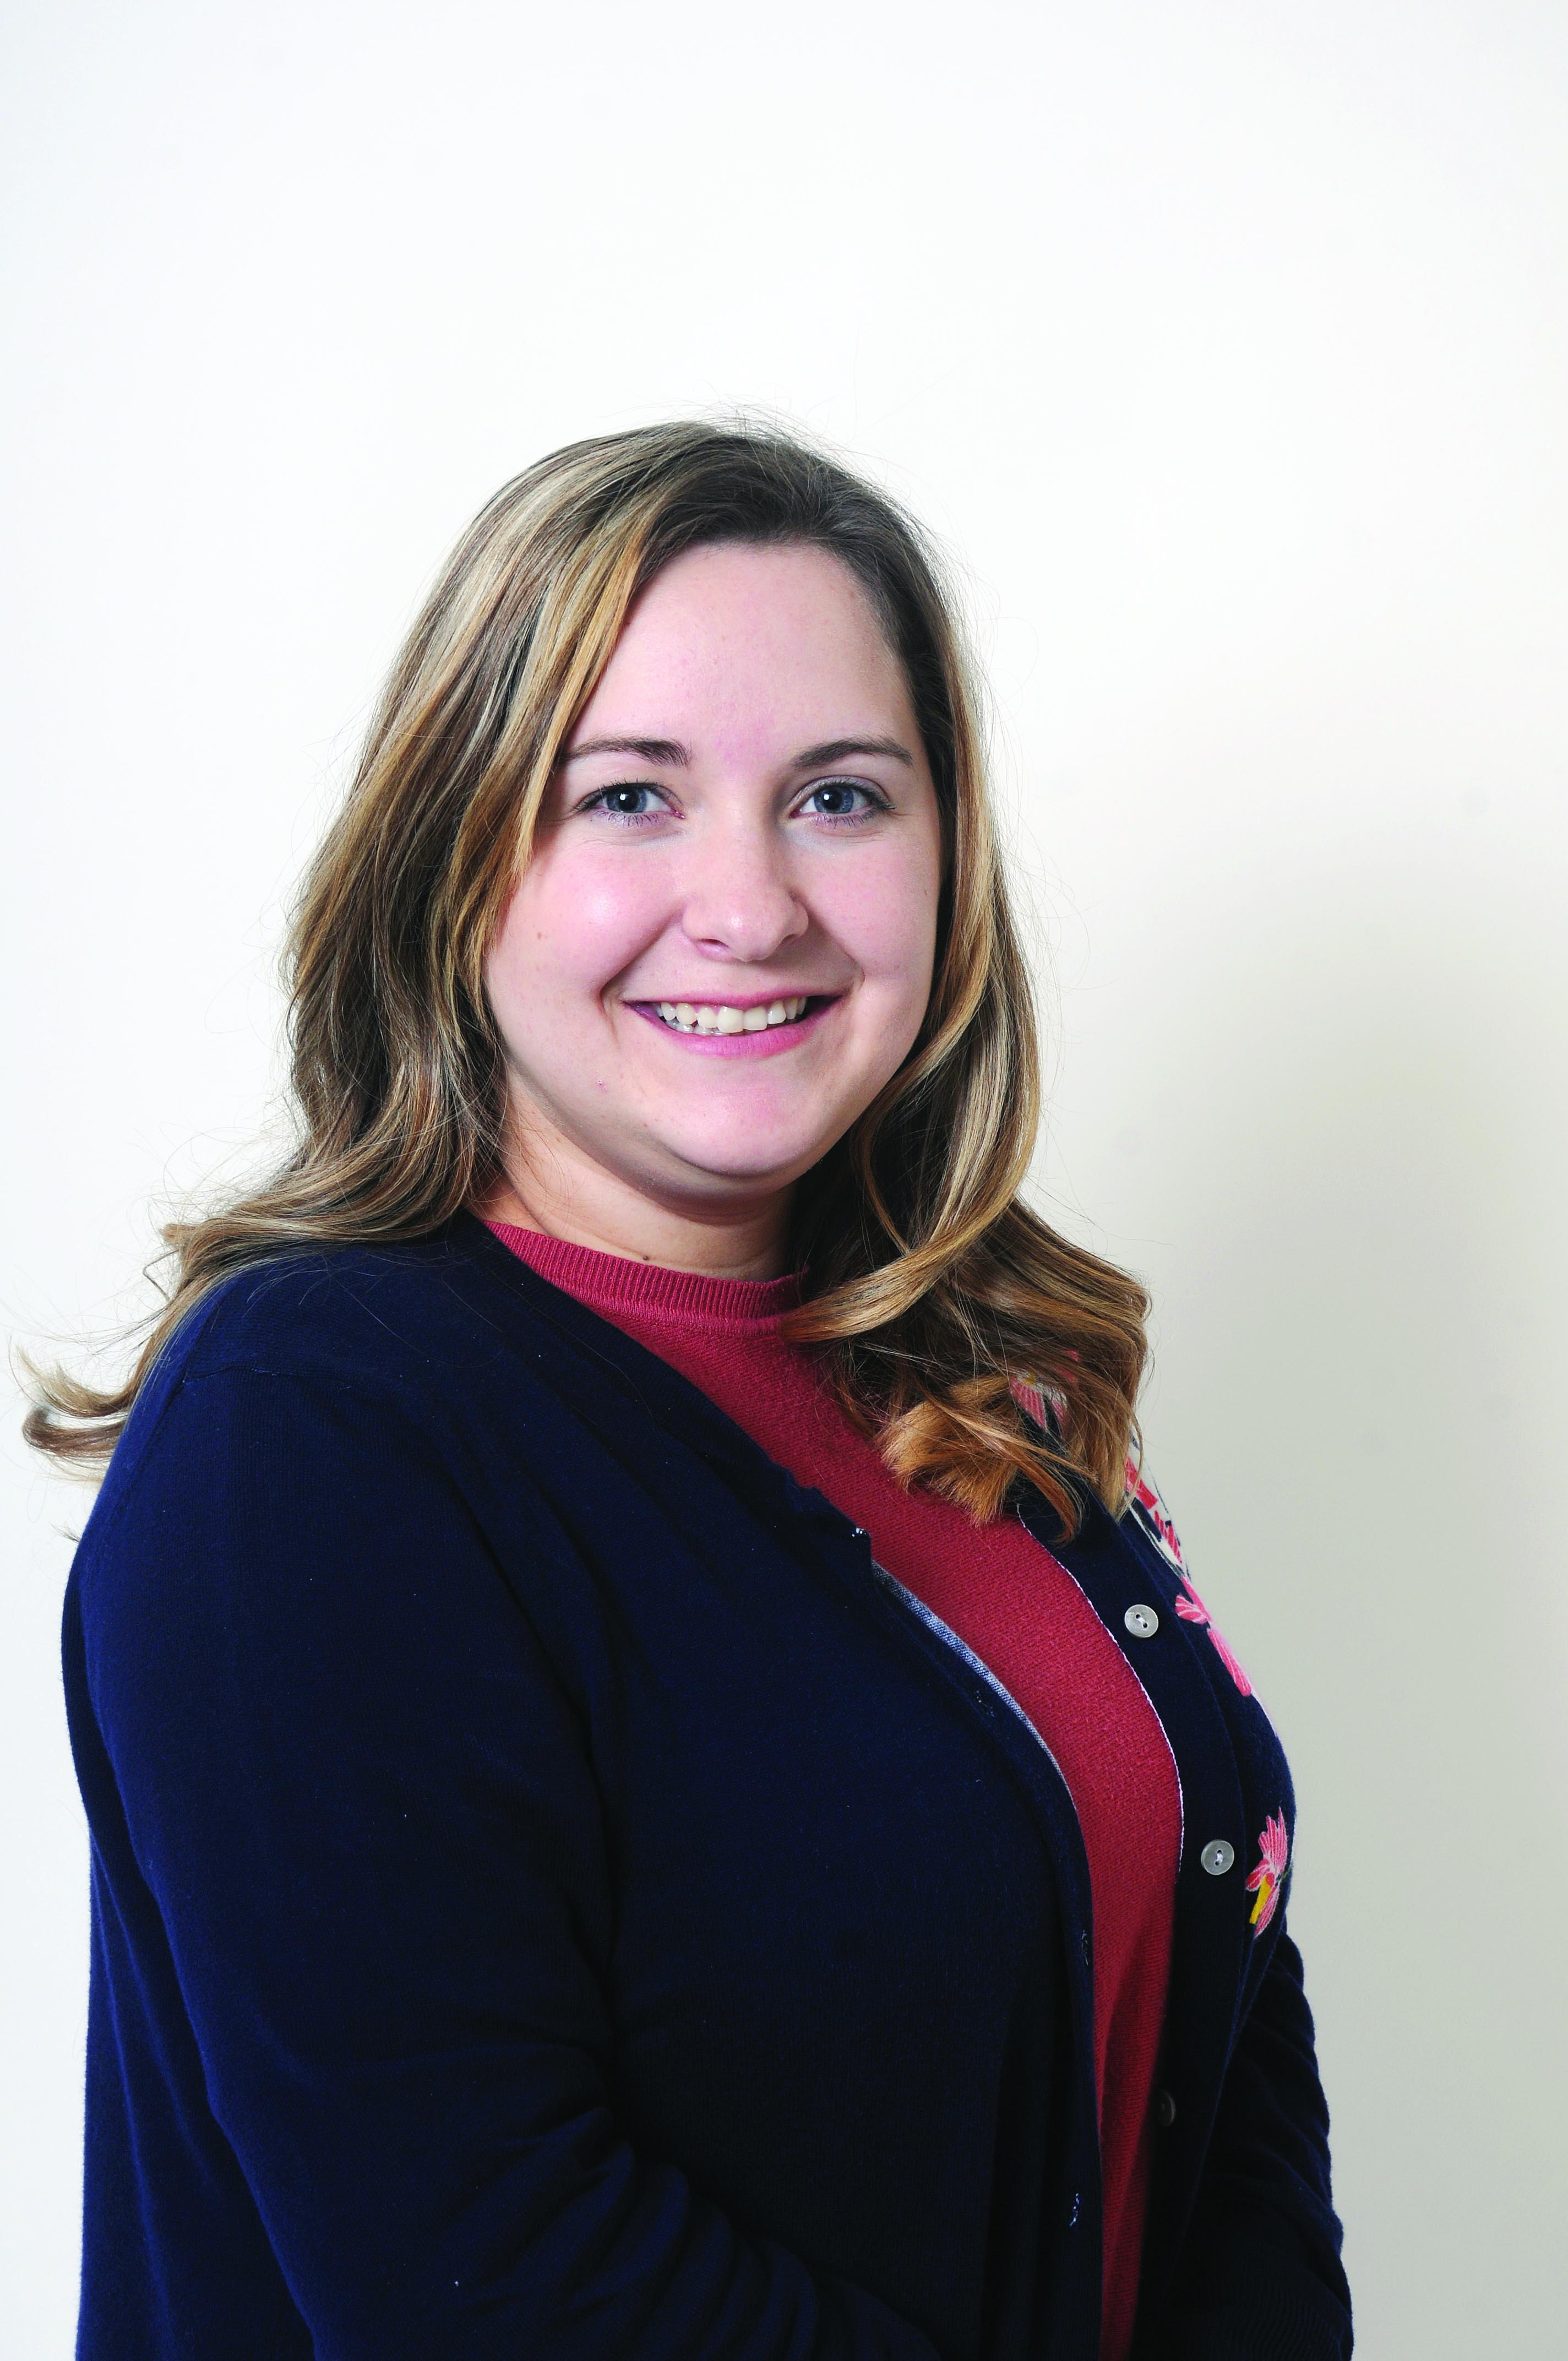 Chloe Langston : Multi-media Advertising Coordinator